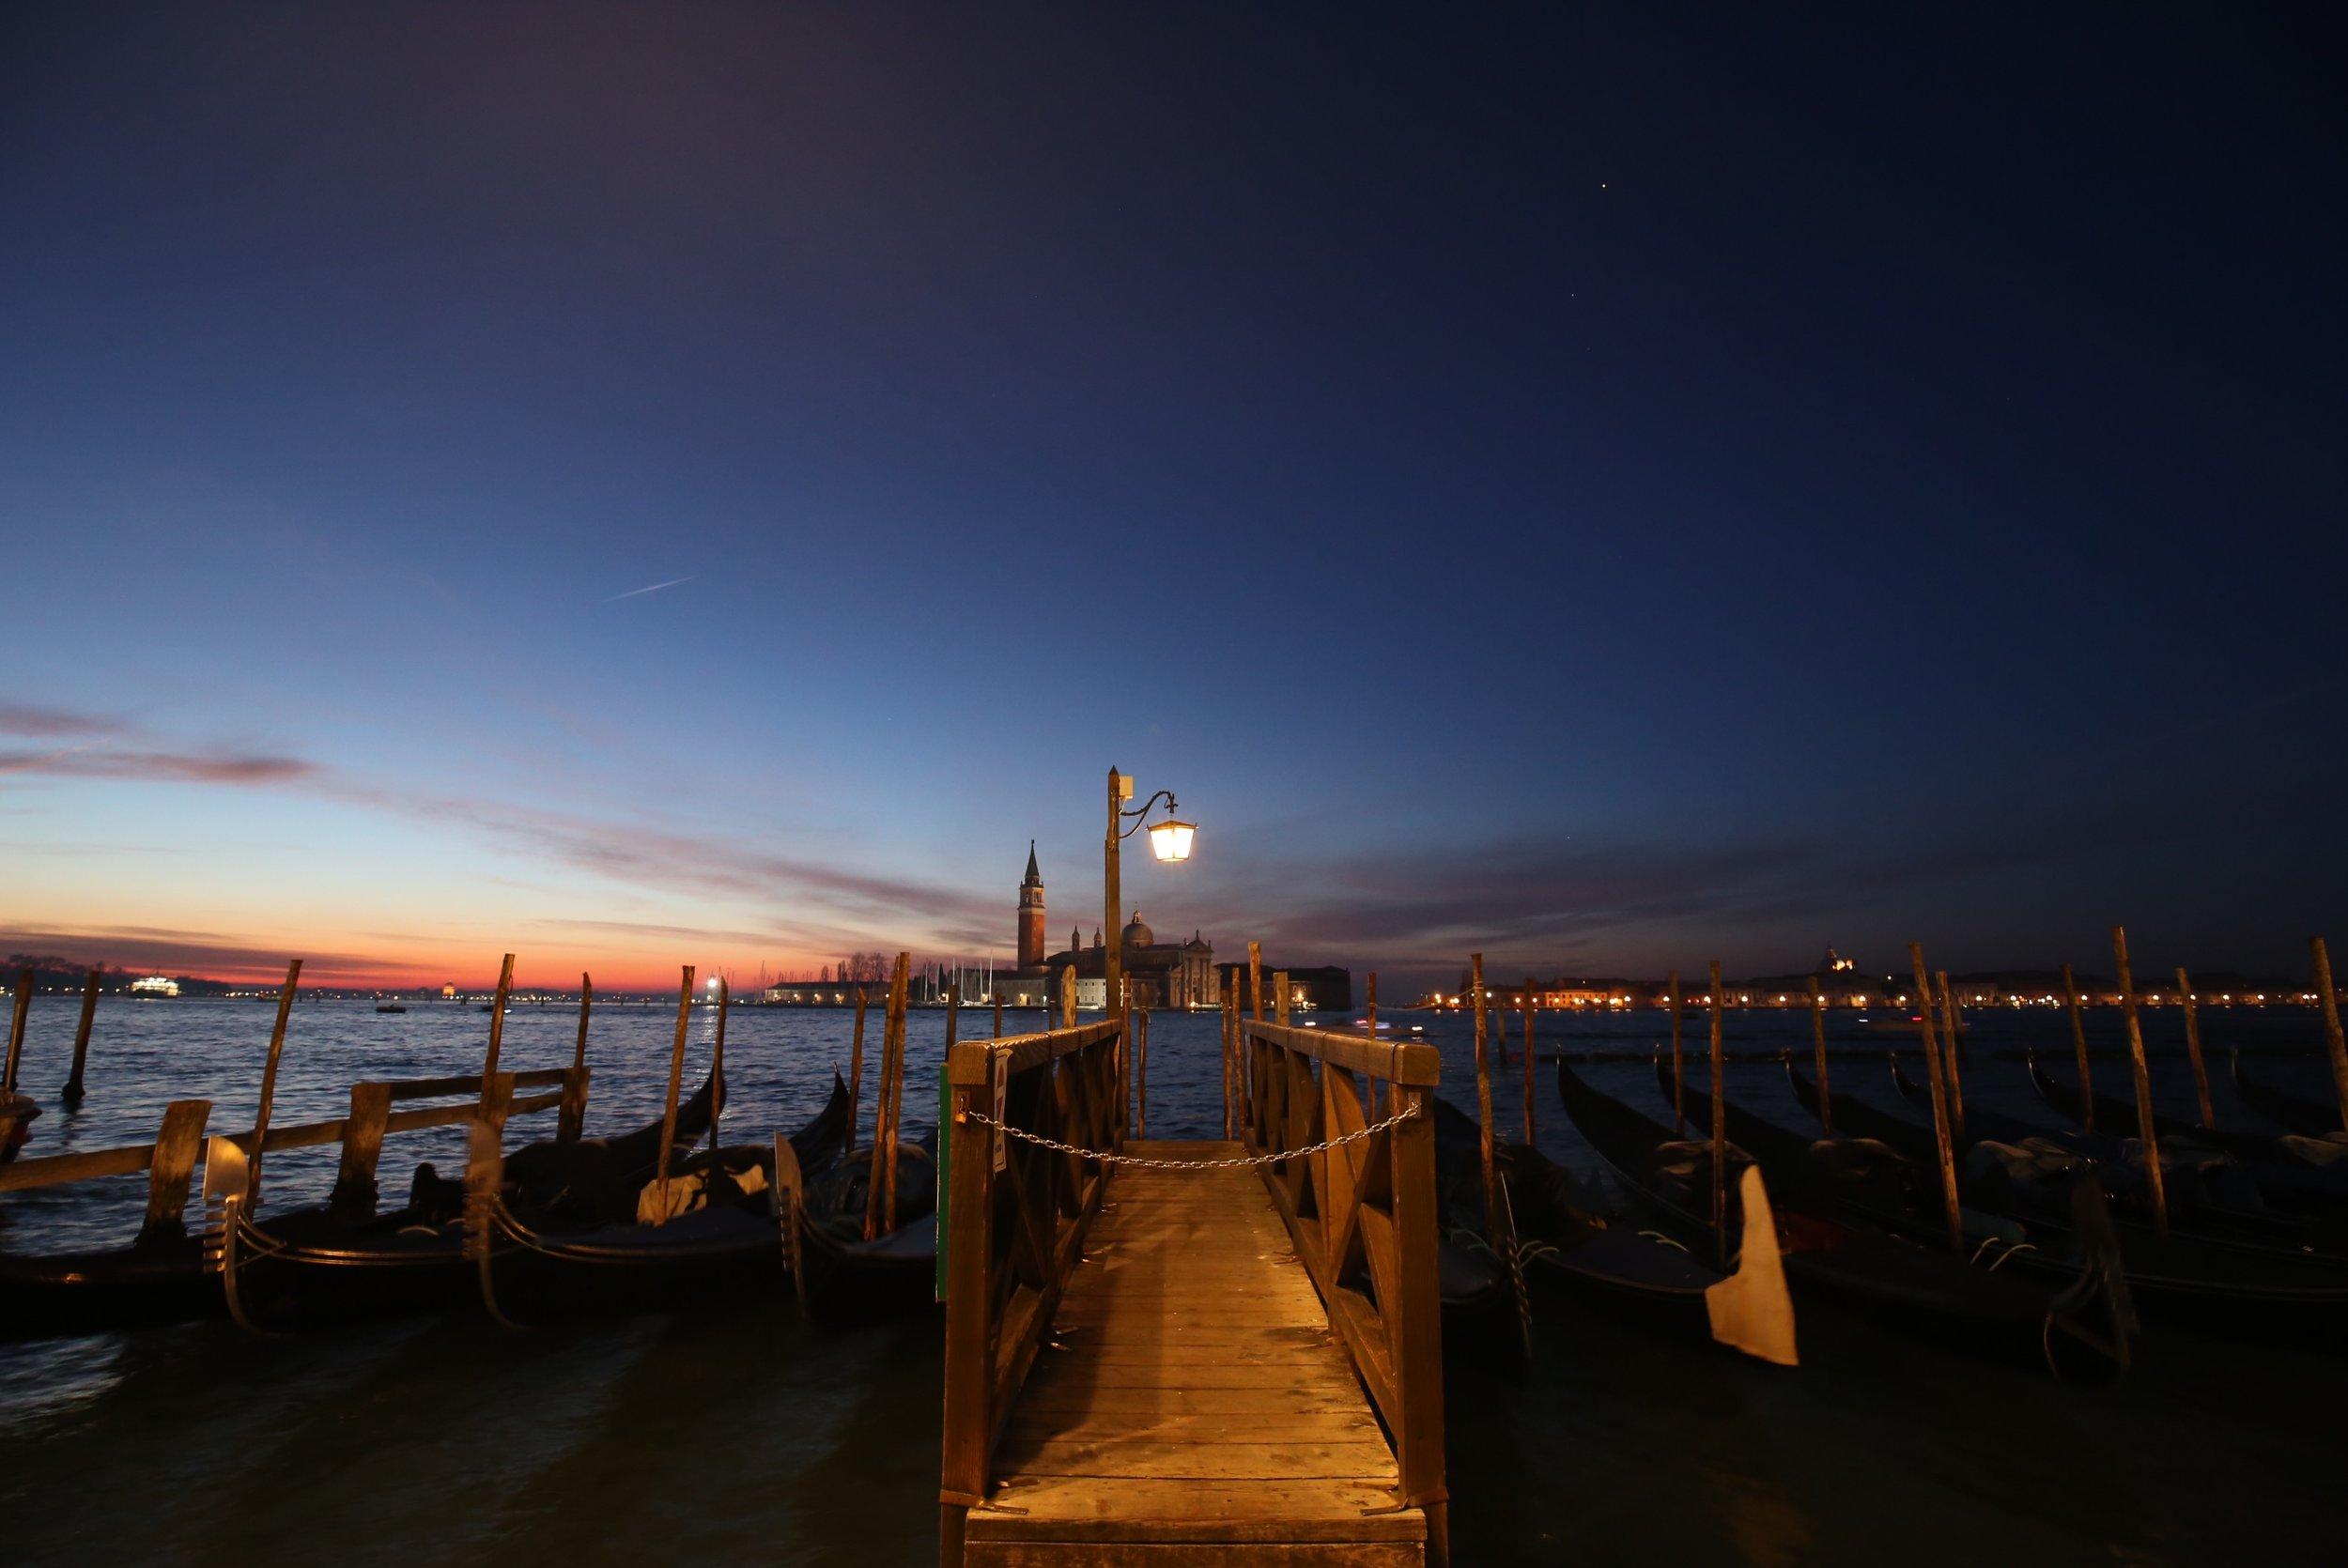 Gondolas sway at sunrise, San Giorgio Maggiore is lit up in the background.